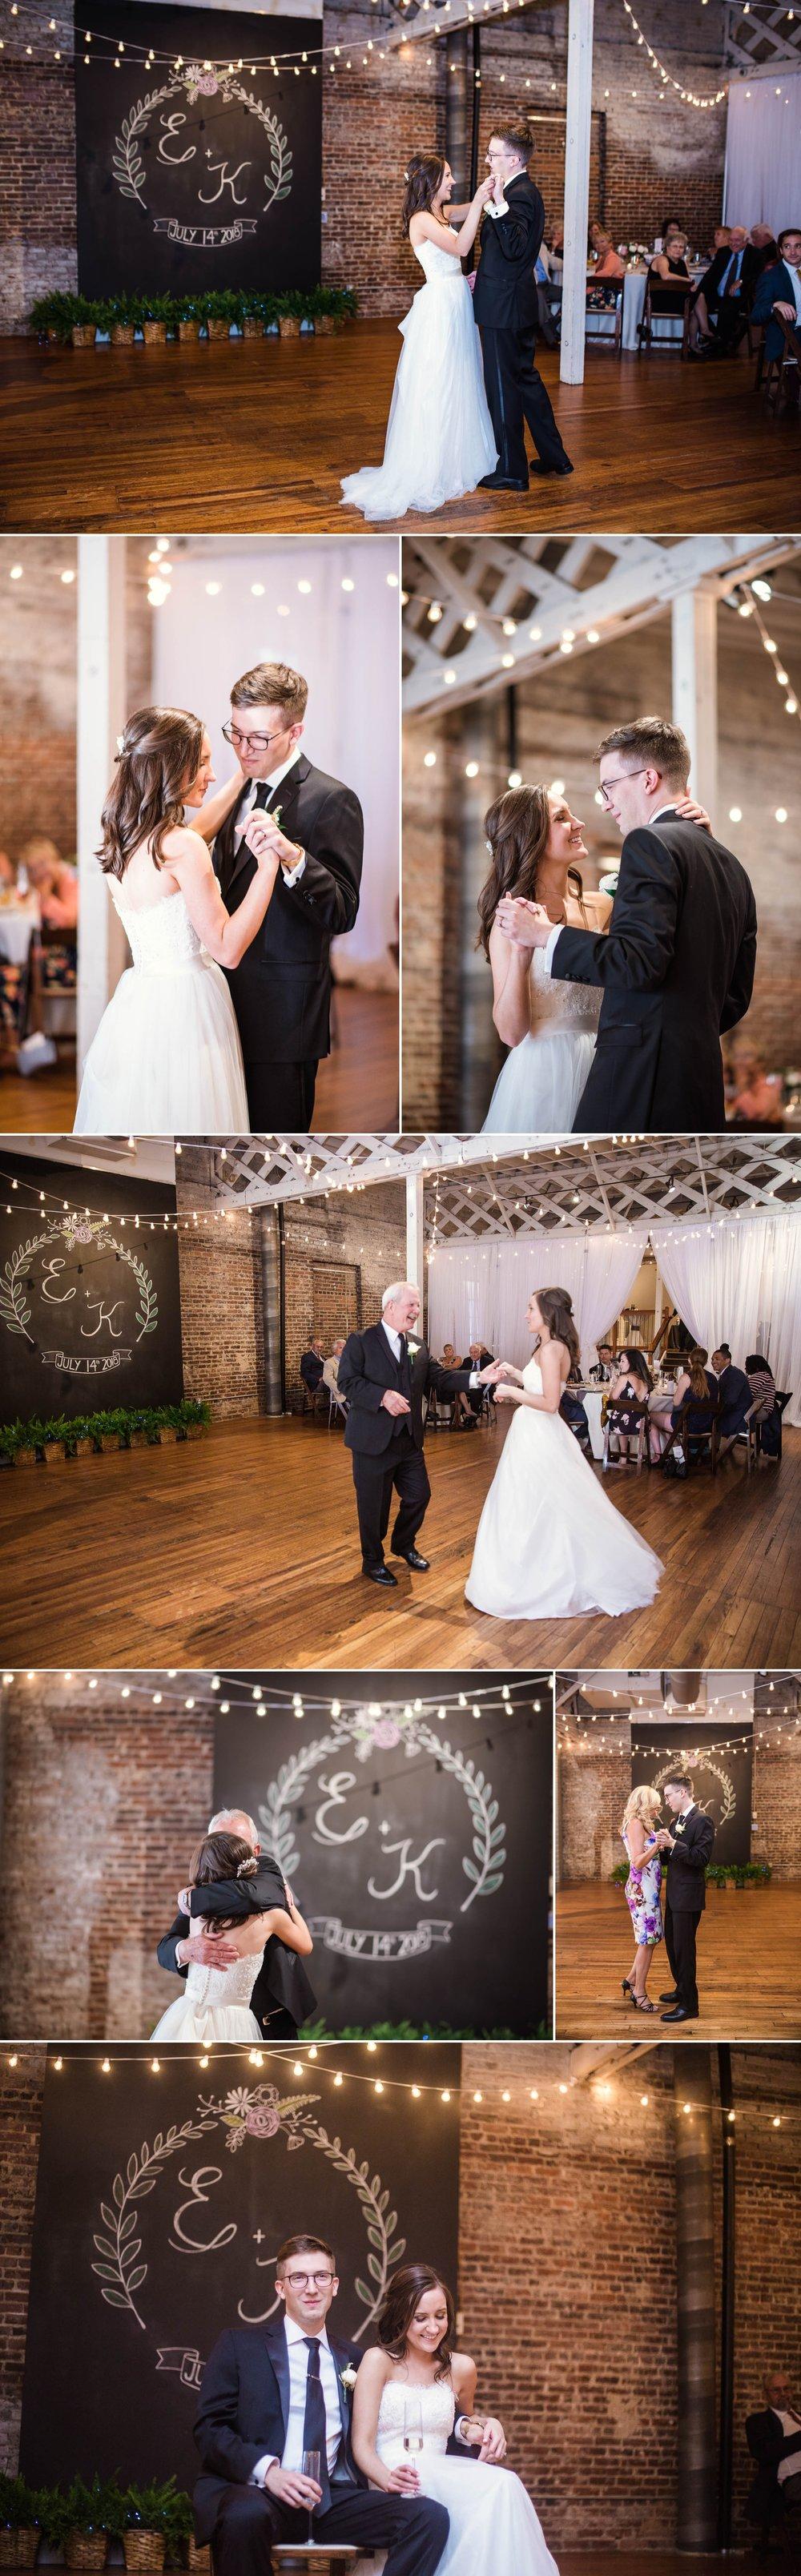 Elizabeth + Kane - Wedding at the Stockroom at 230 - Raleigh North Carolina Wedding Photographer 18.jpg